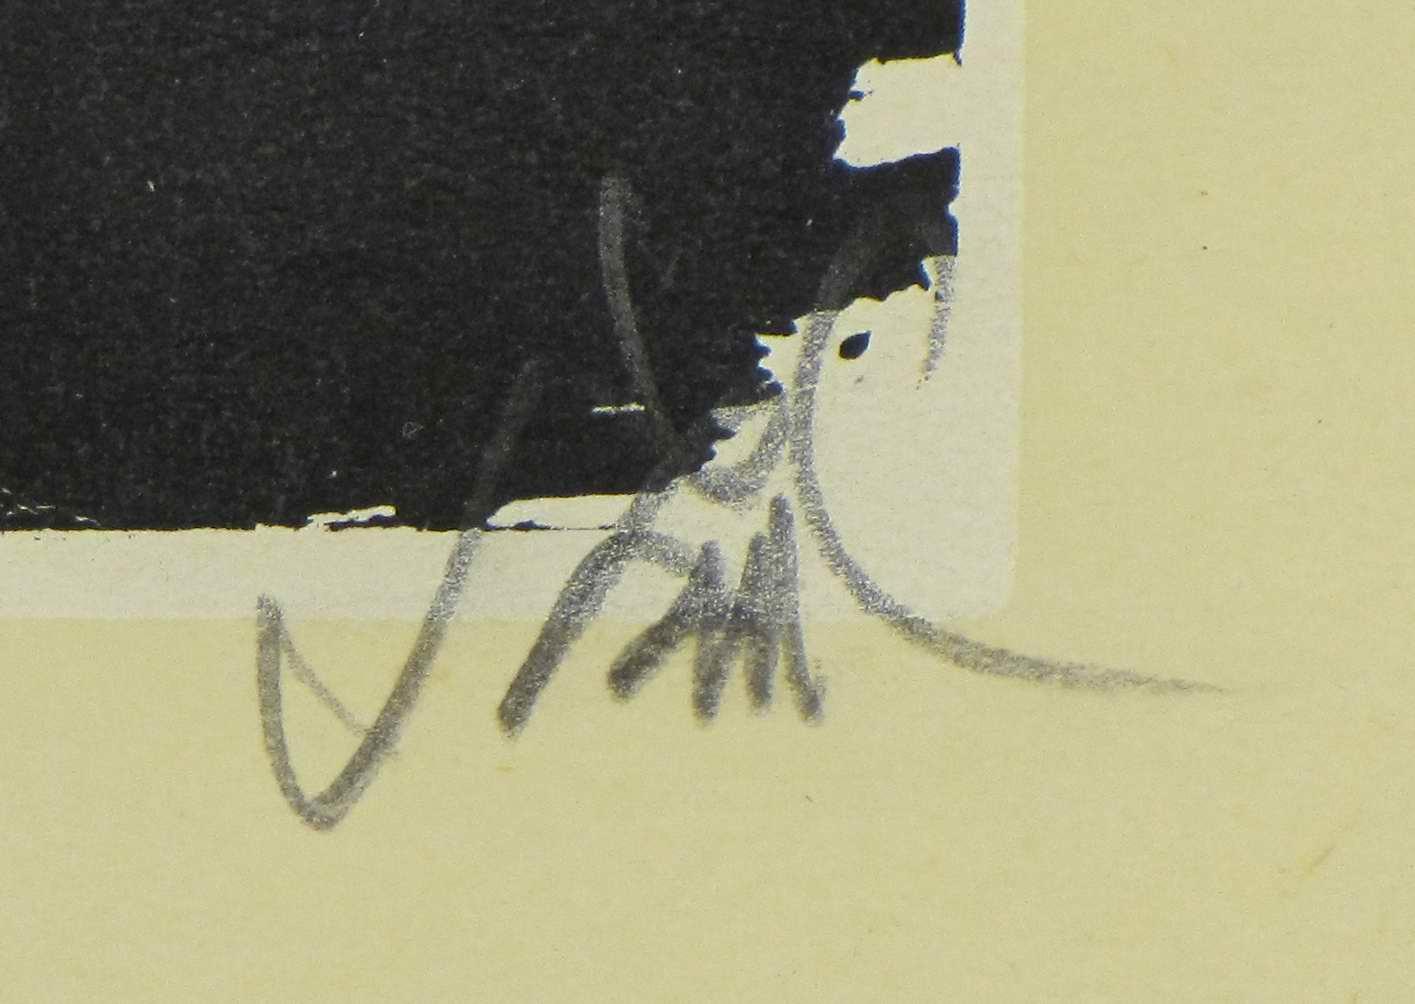 103-7sj.jpg (1415�1004)